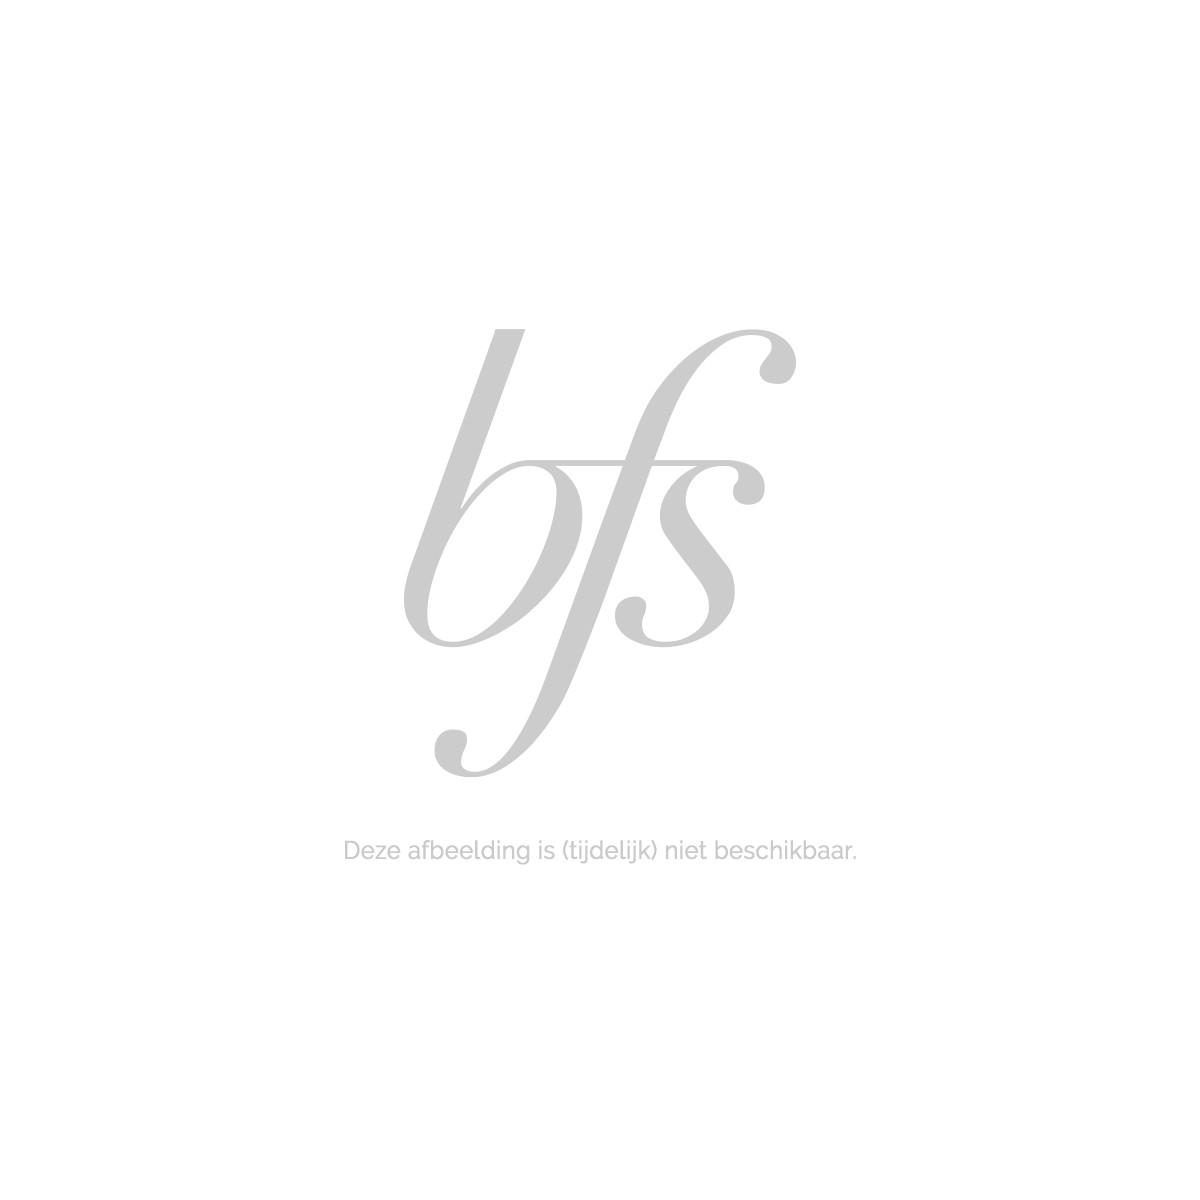 Janzen Navulling Diffuser Skin 90 (Incl. Stokjes) 200 Ml